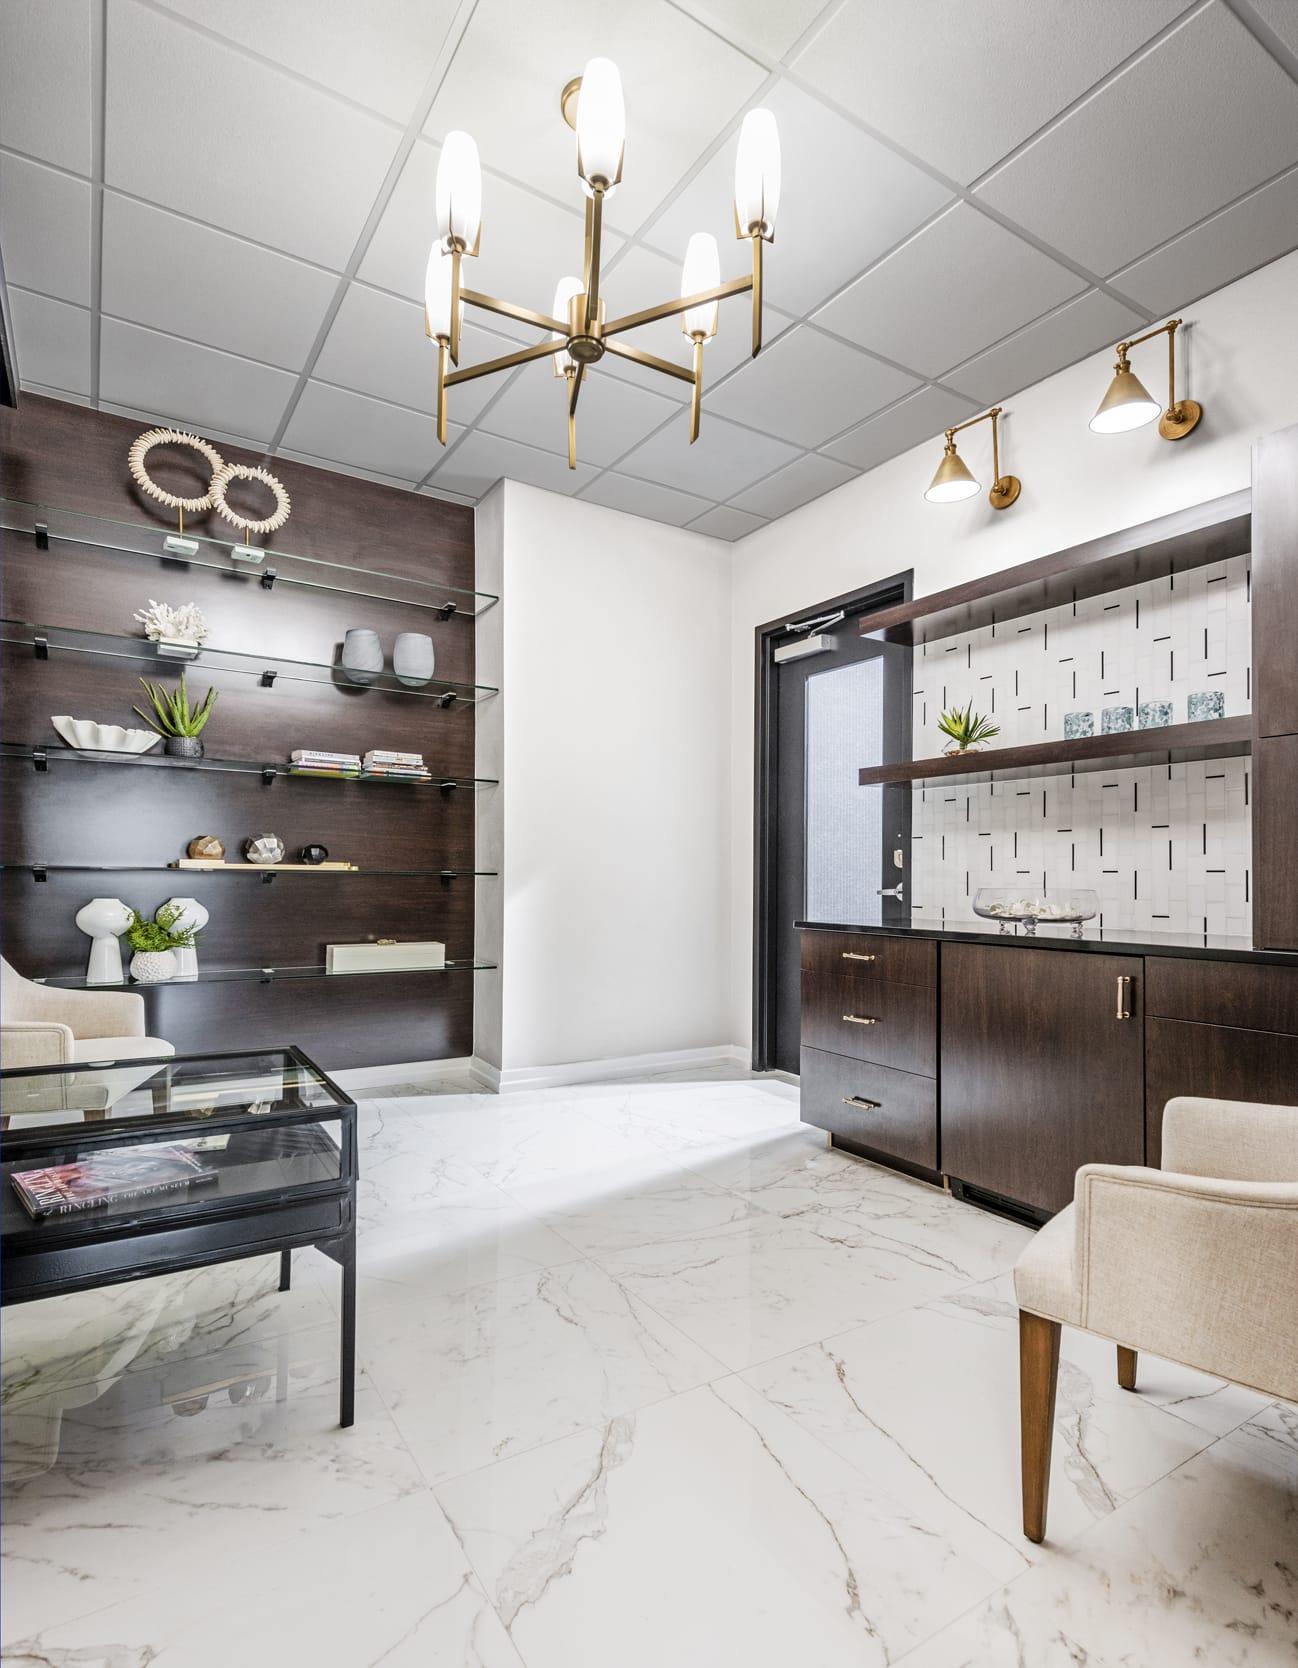 Office Waiting Room Hazelnut Cabinets Brass Light Fixtures White Marble Tiled Floor